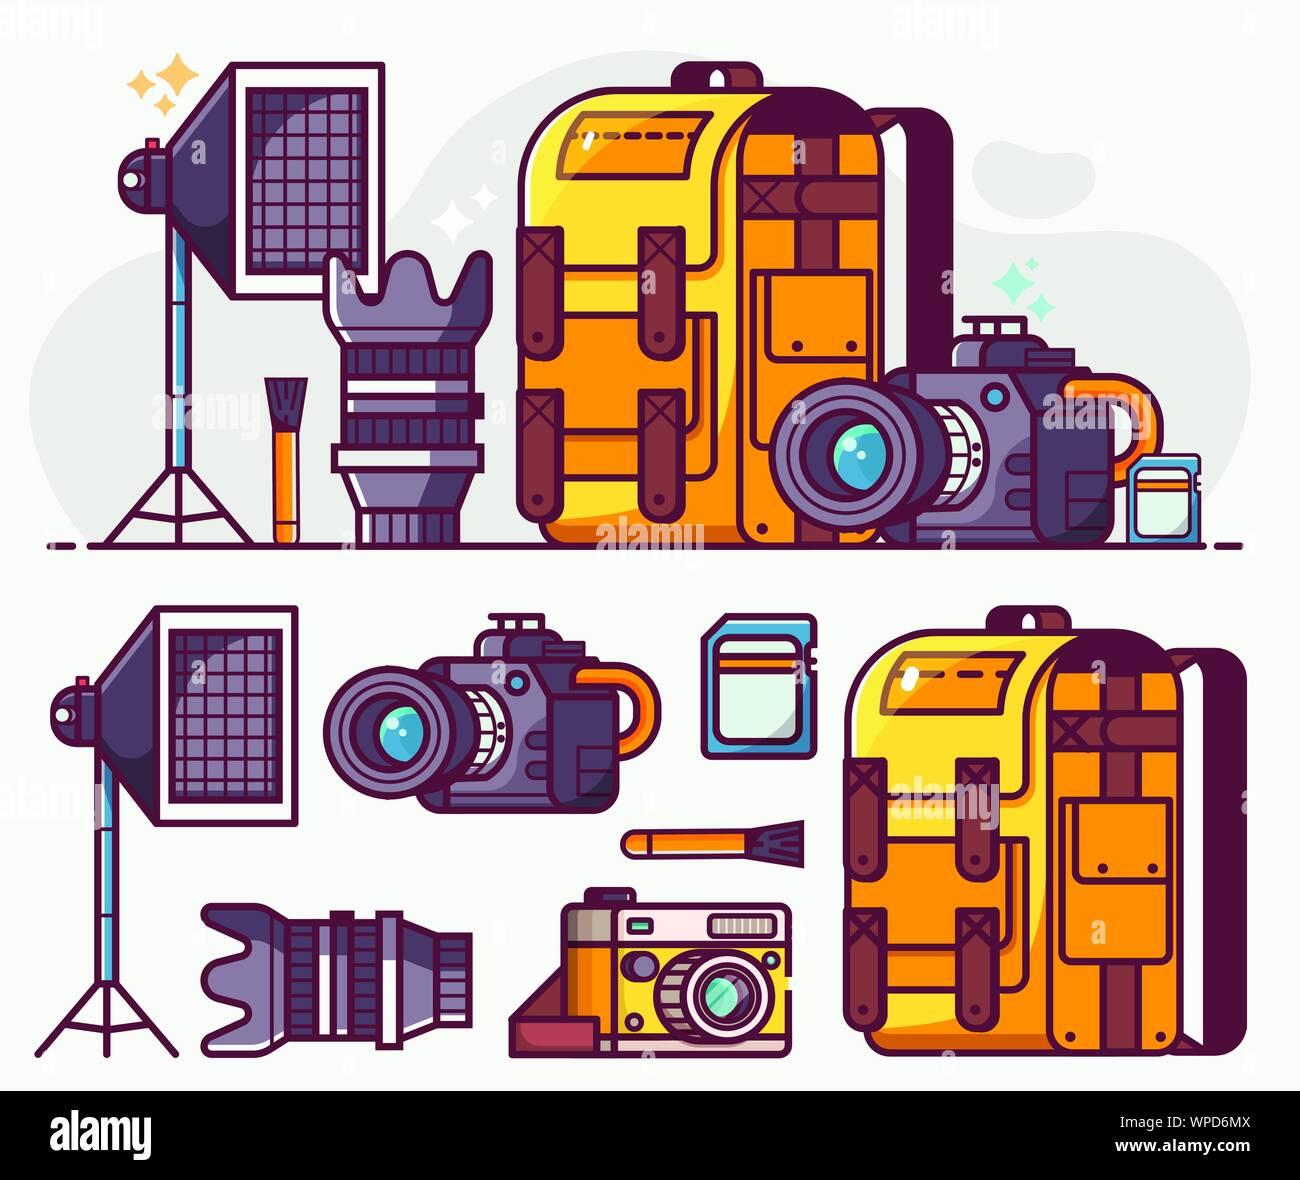 Digital Photo Studio Equipment Line Icons Set Stock Vector